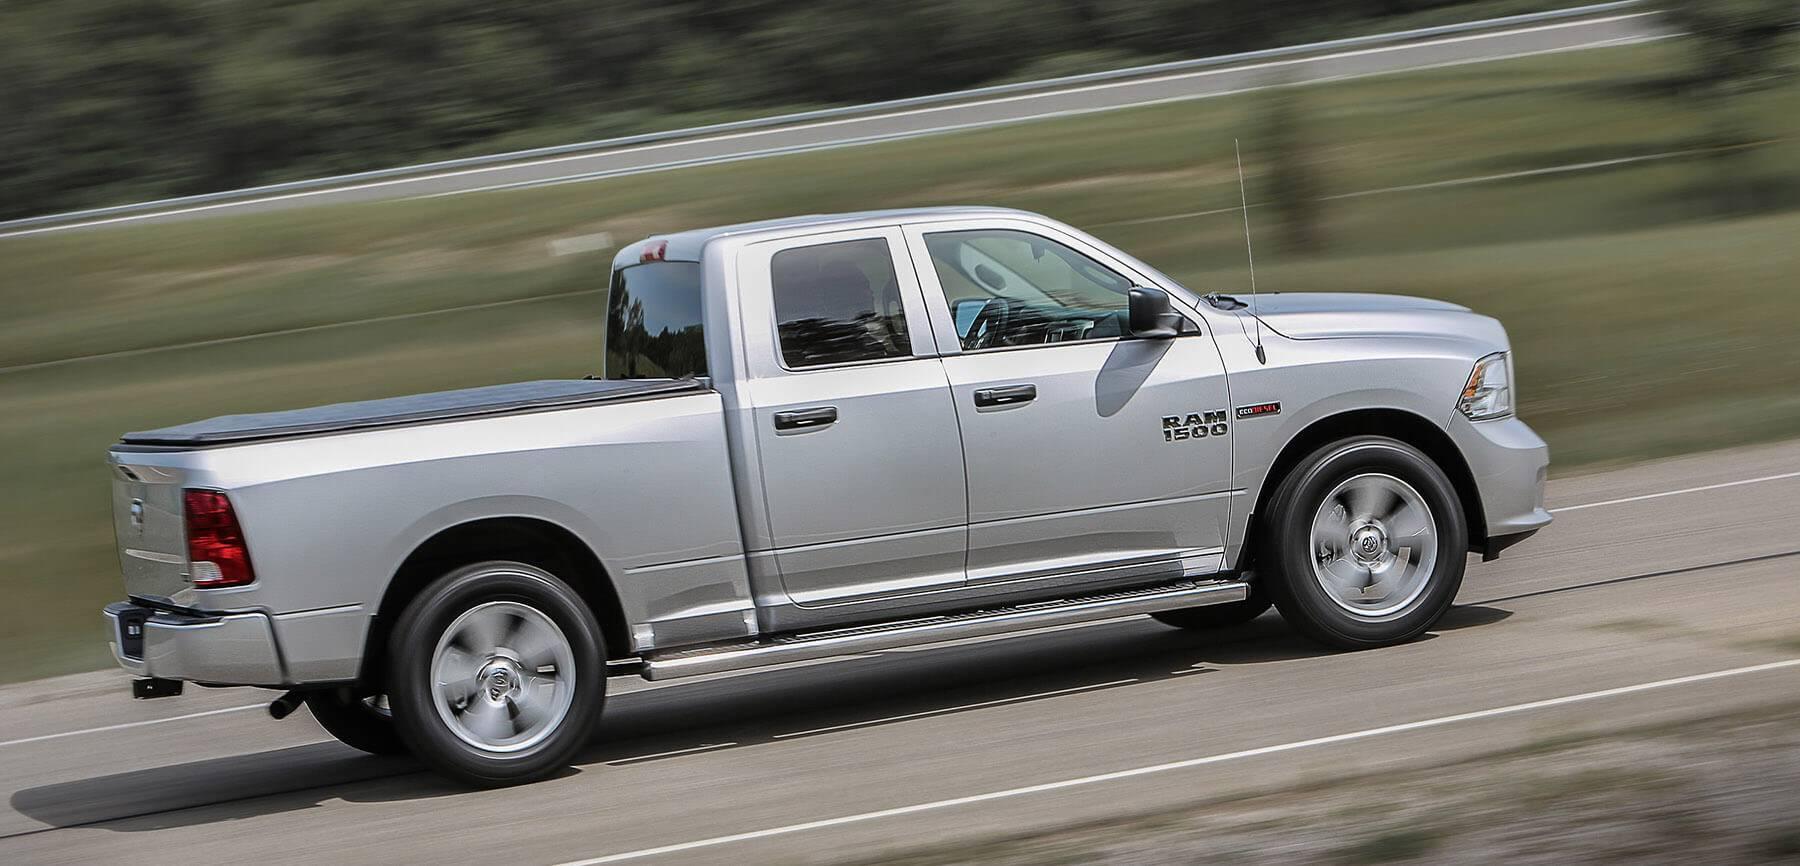 2016 Ram 1500 driving